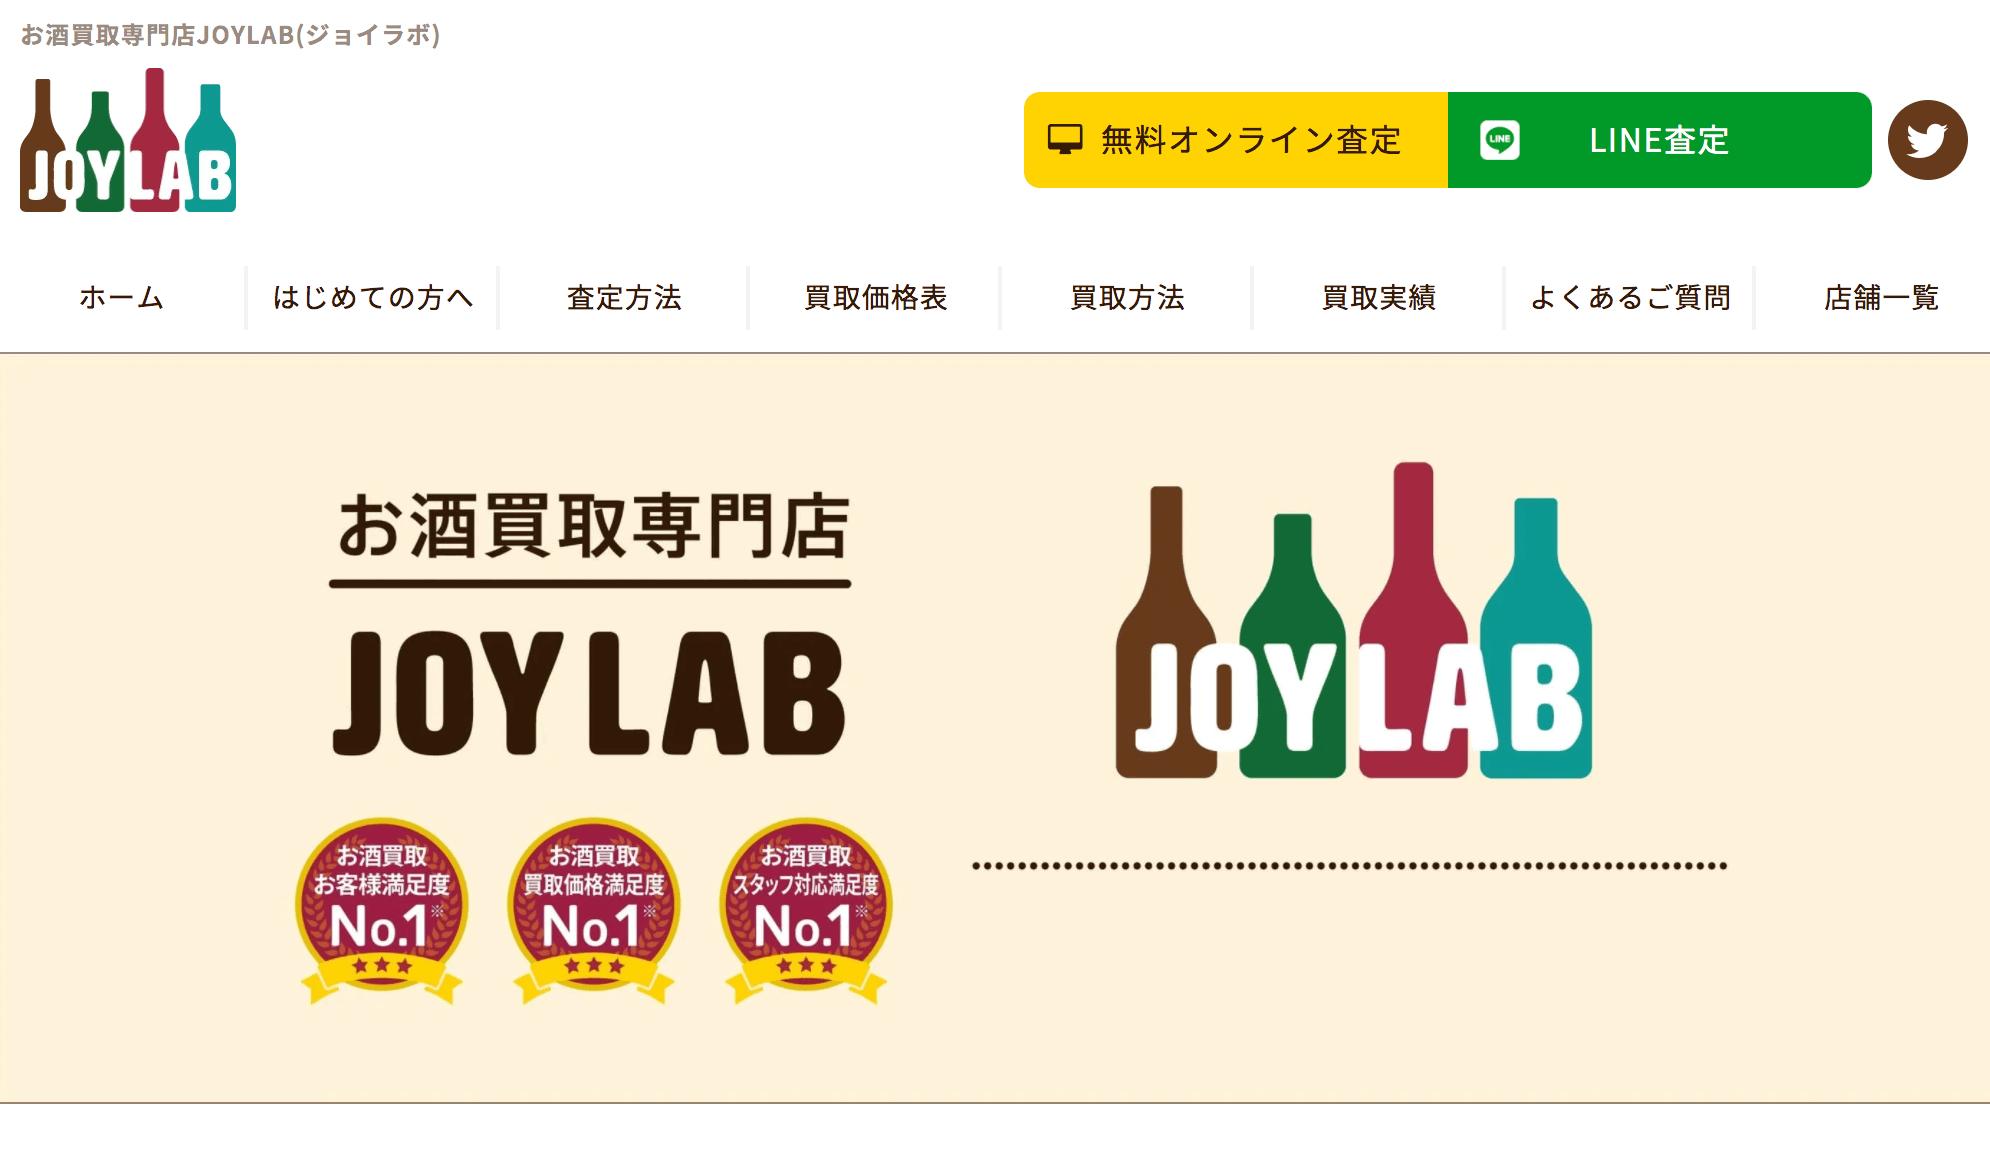 JOYLAB(ジョイラボ)の公式サイト